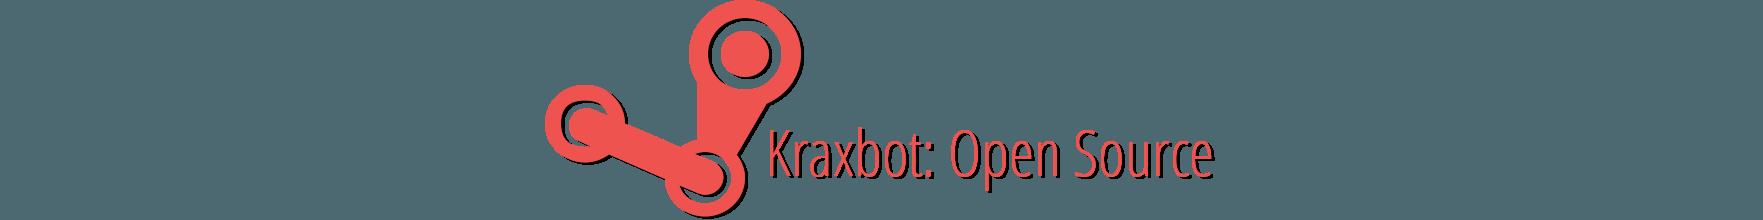 Kraxbot: Open Source